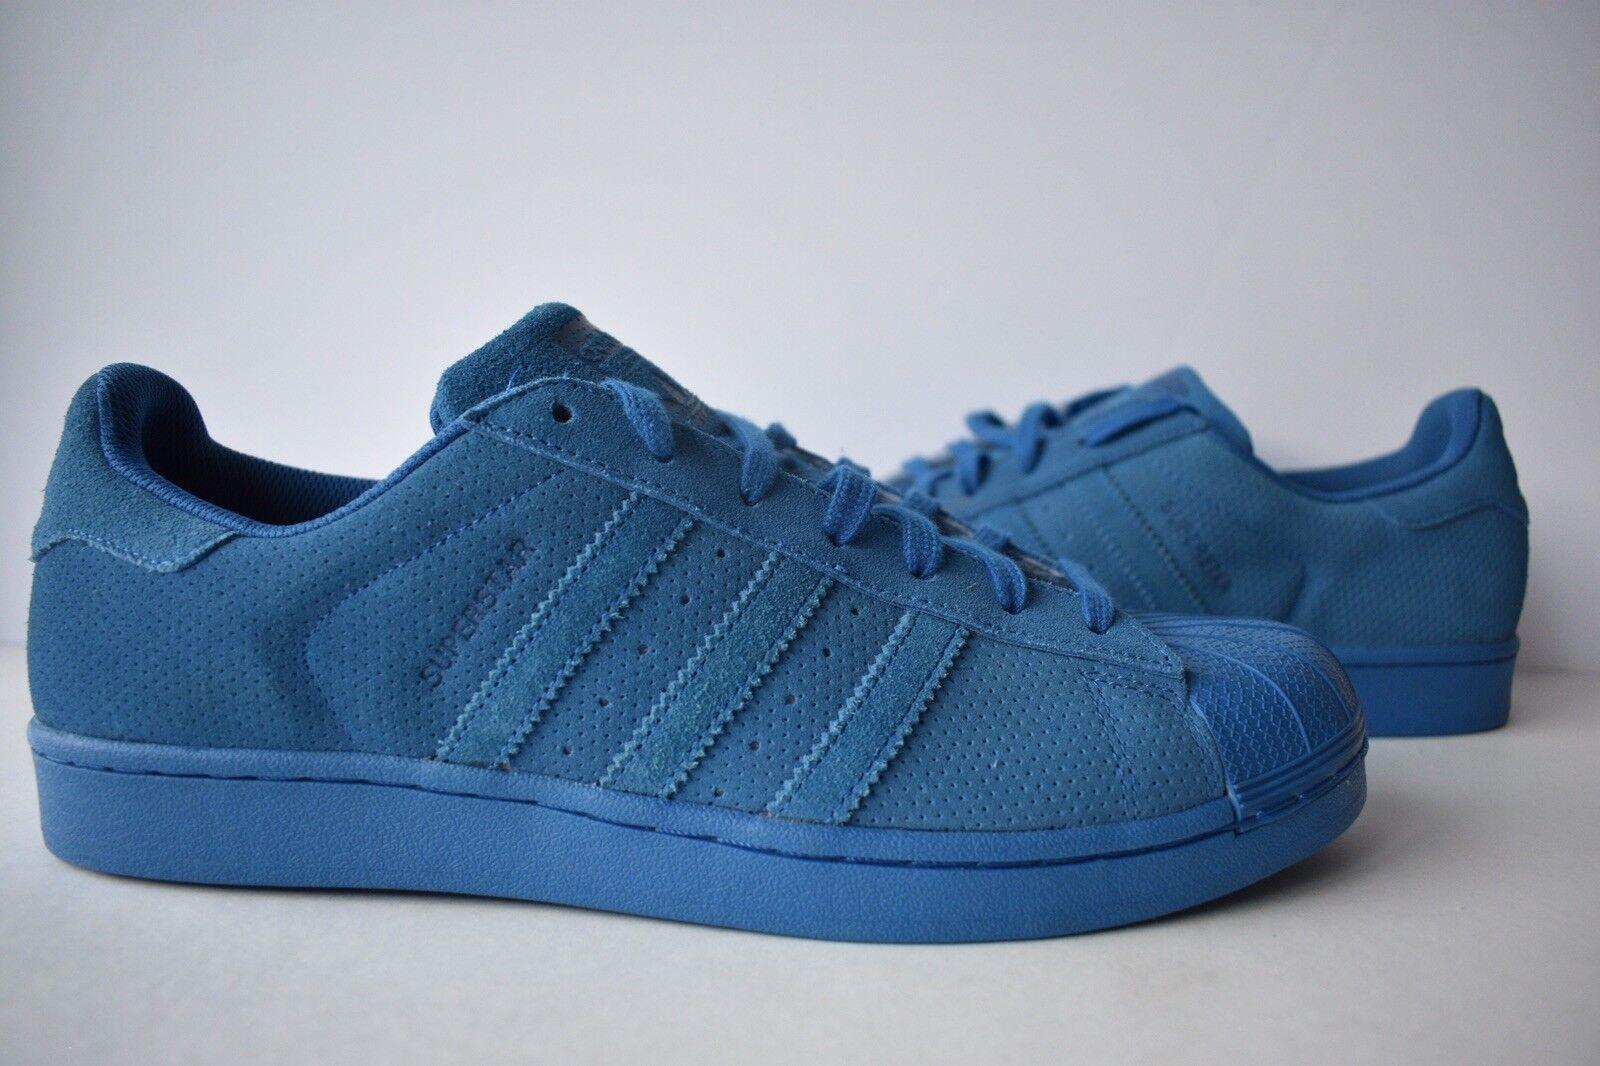 Adidas Originals Superstar RT Suede Sneakers shoes bluee AQ4165 Men Size 11.5 NEW